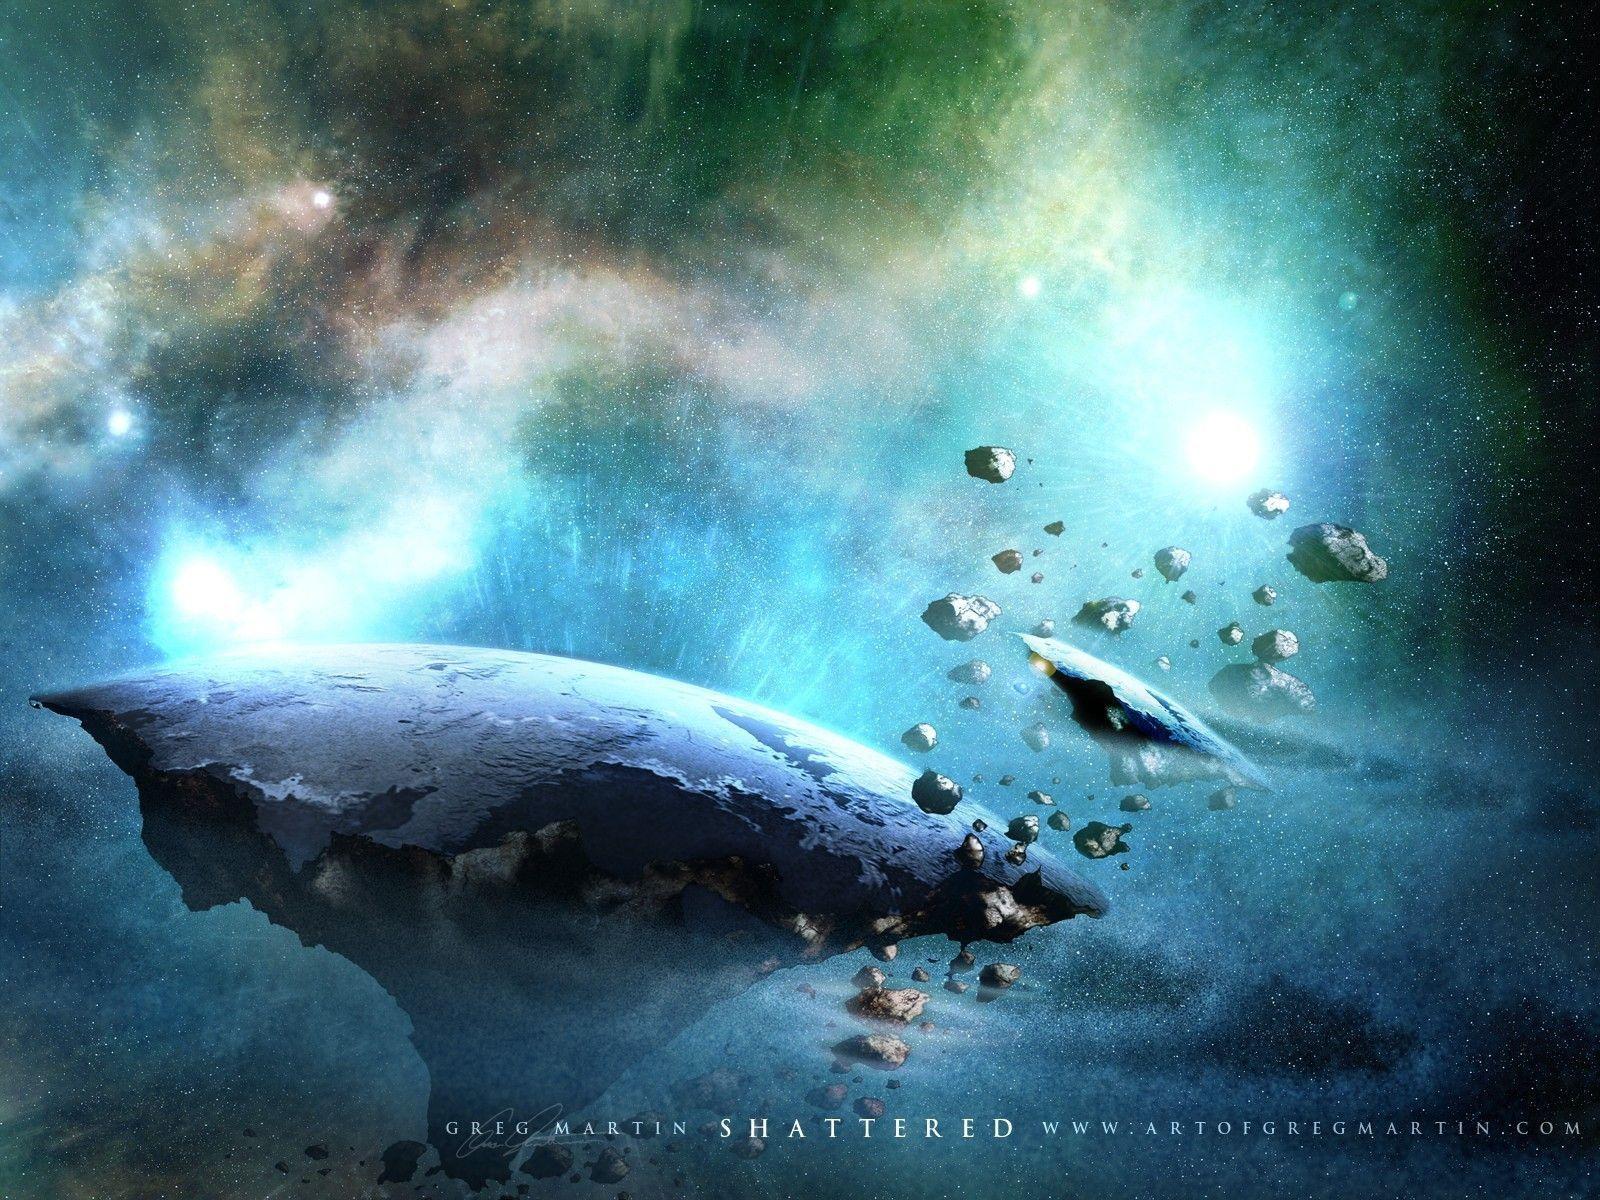 http://3.bp.blogspot.com/-ixDgooare9A/TtxU-5CdRpI/AAAAAAAAAn8/TIbSCeaLiOI/s1600/space-art-3-723035.jpg